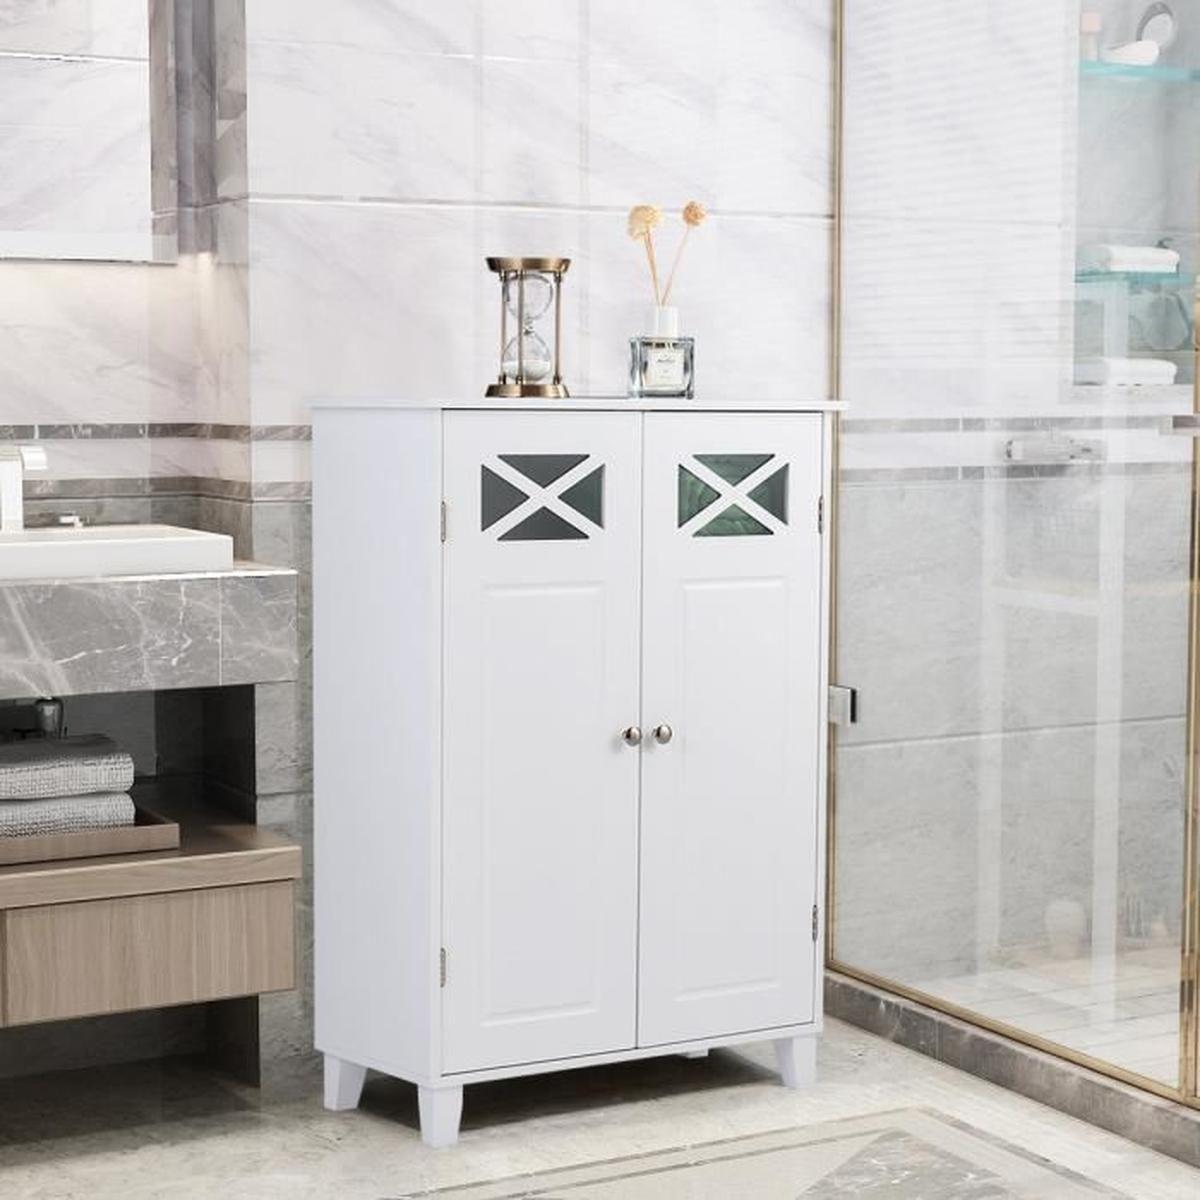 Meuble De Rangement Bas Blanc Salle De Bain avec Meuble Salle De Bain Pas Cher Belgique